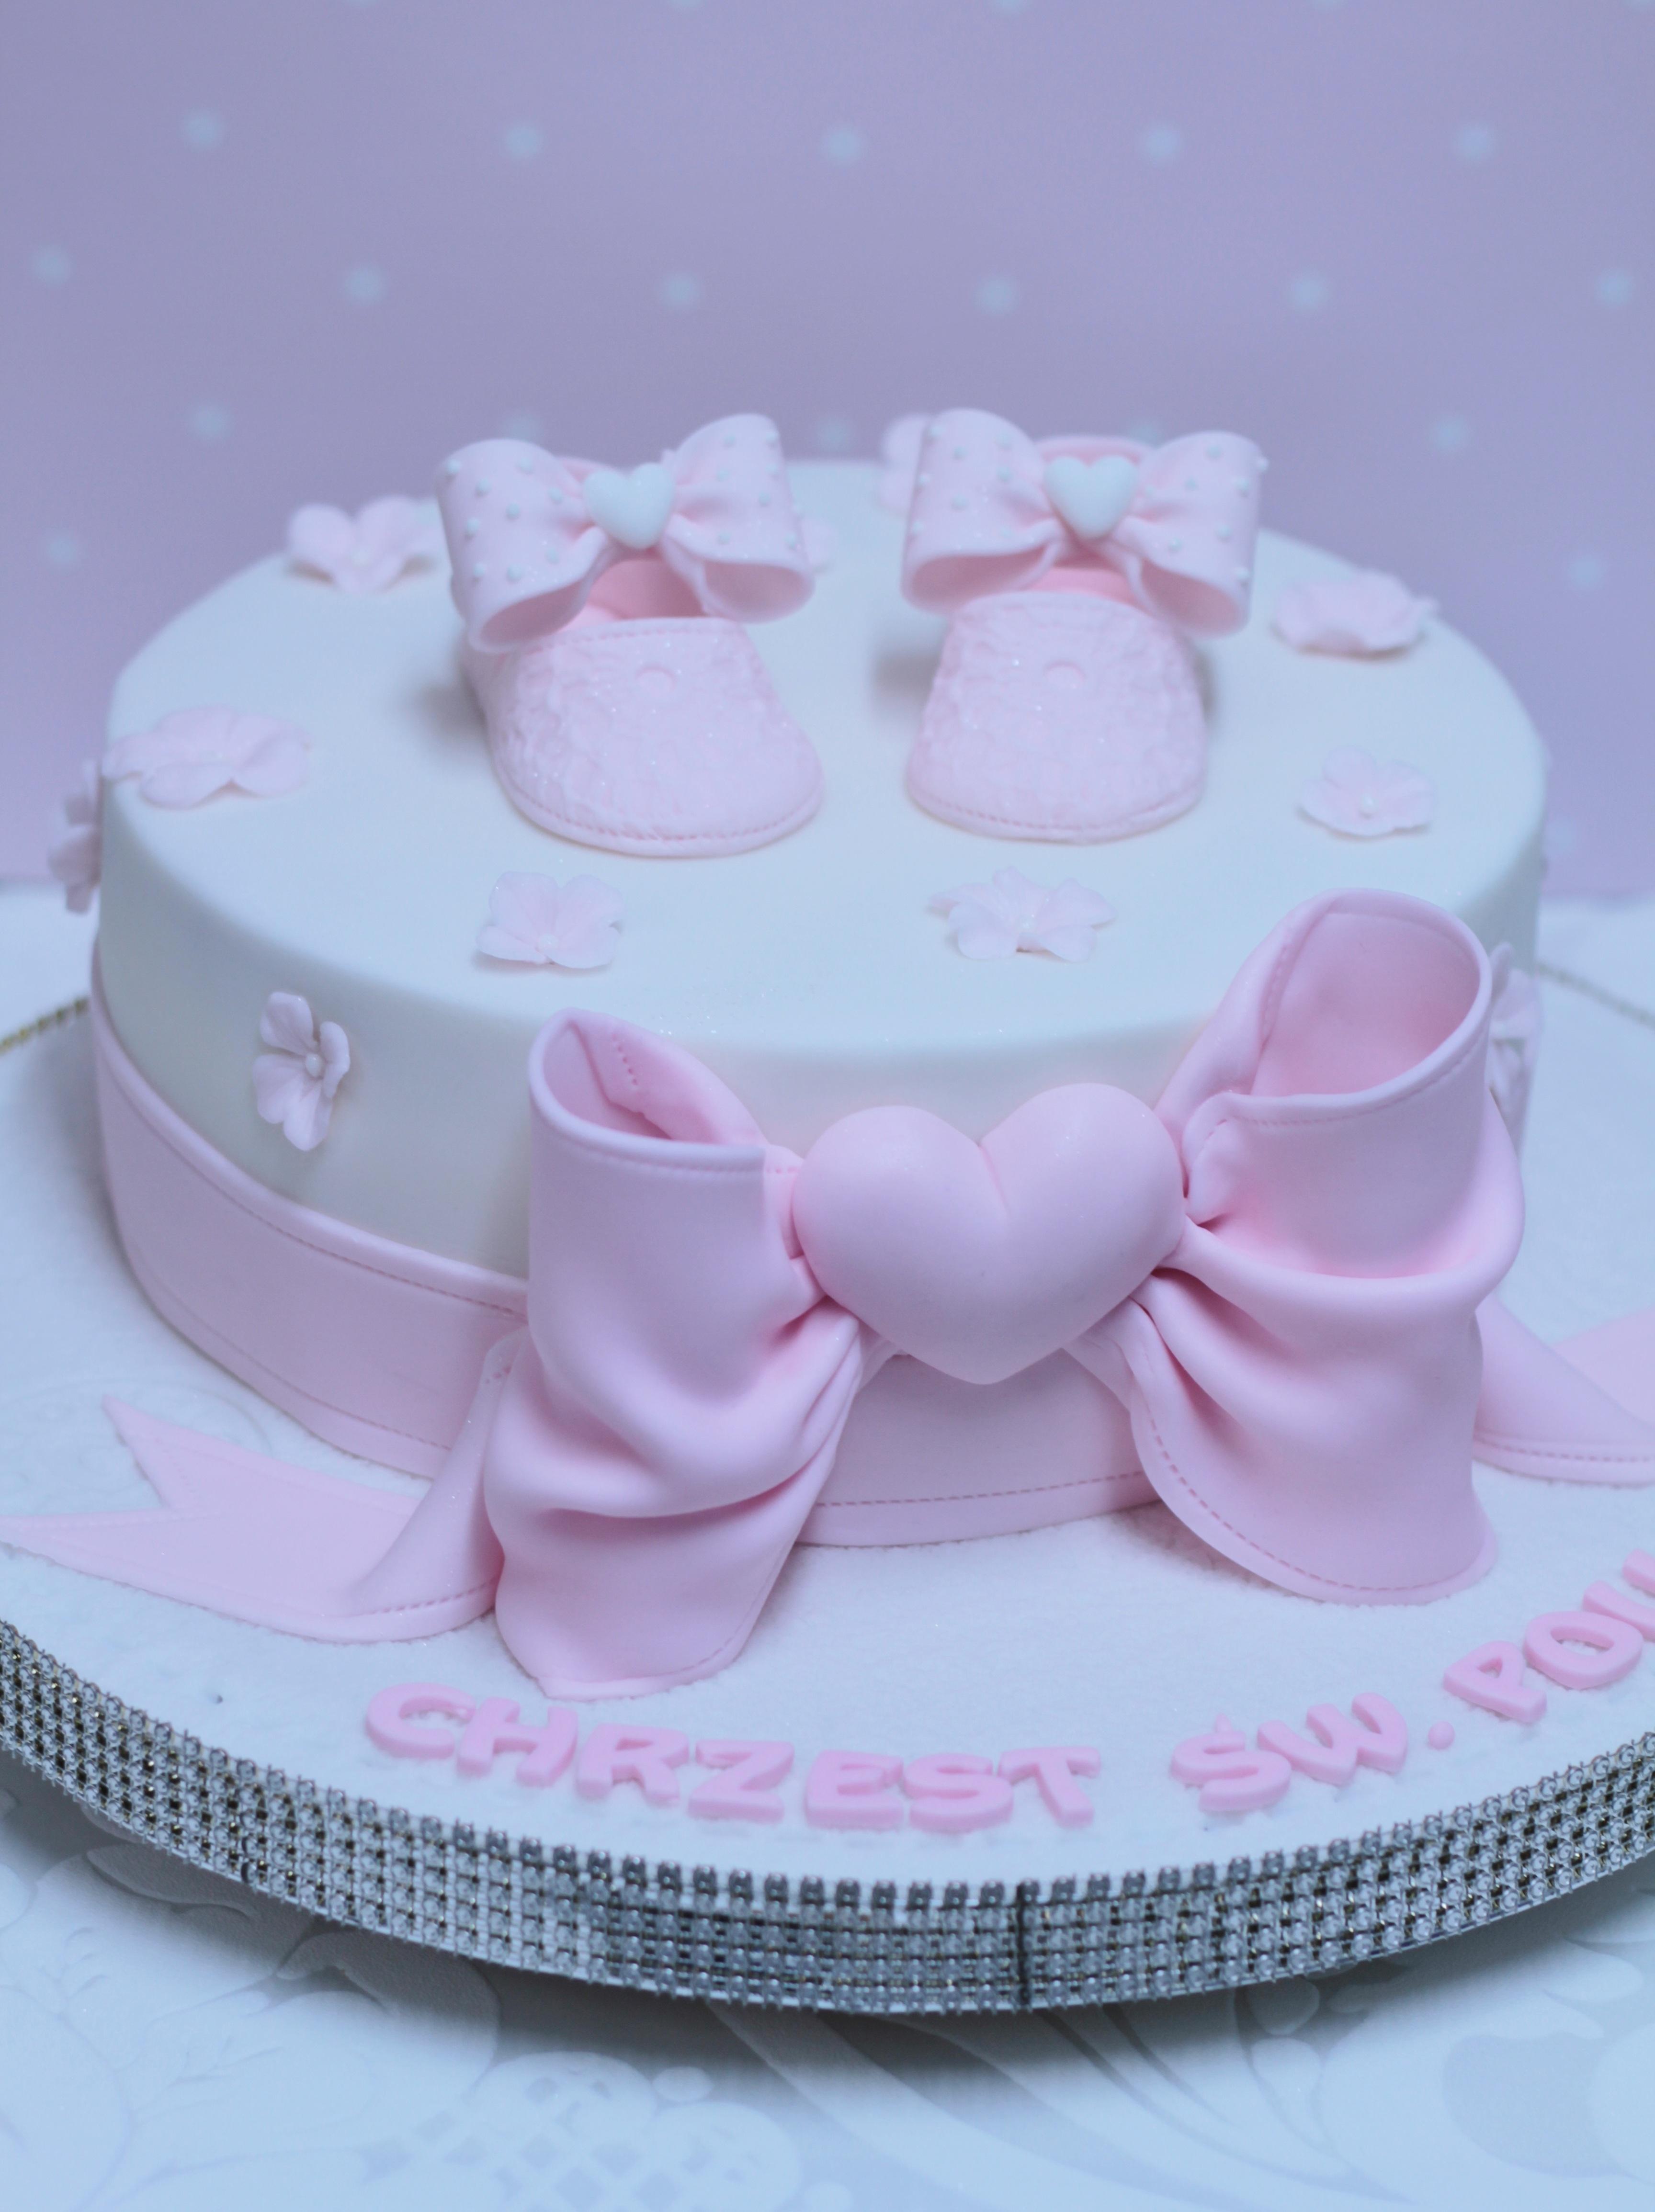 fotos gratis creativo ptalo decoracin comida nio rosado postre cocina pastel de cumpleaos formacin de hielo fondant productos horneados